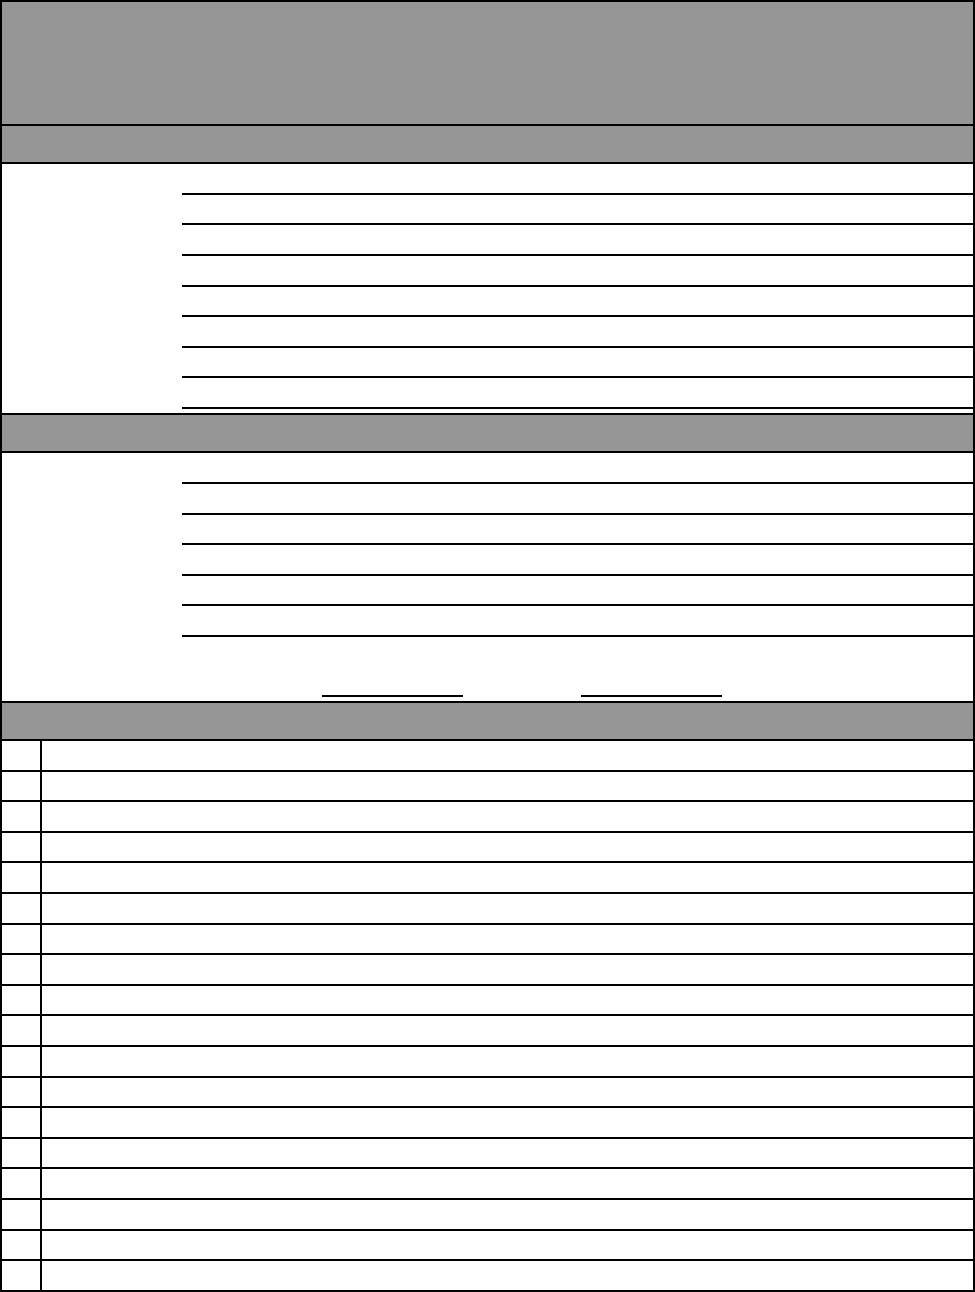 Urgent Fax Cover Sheet 1